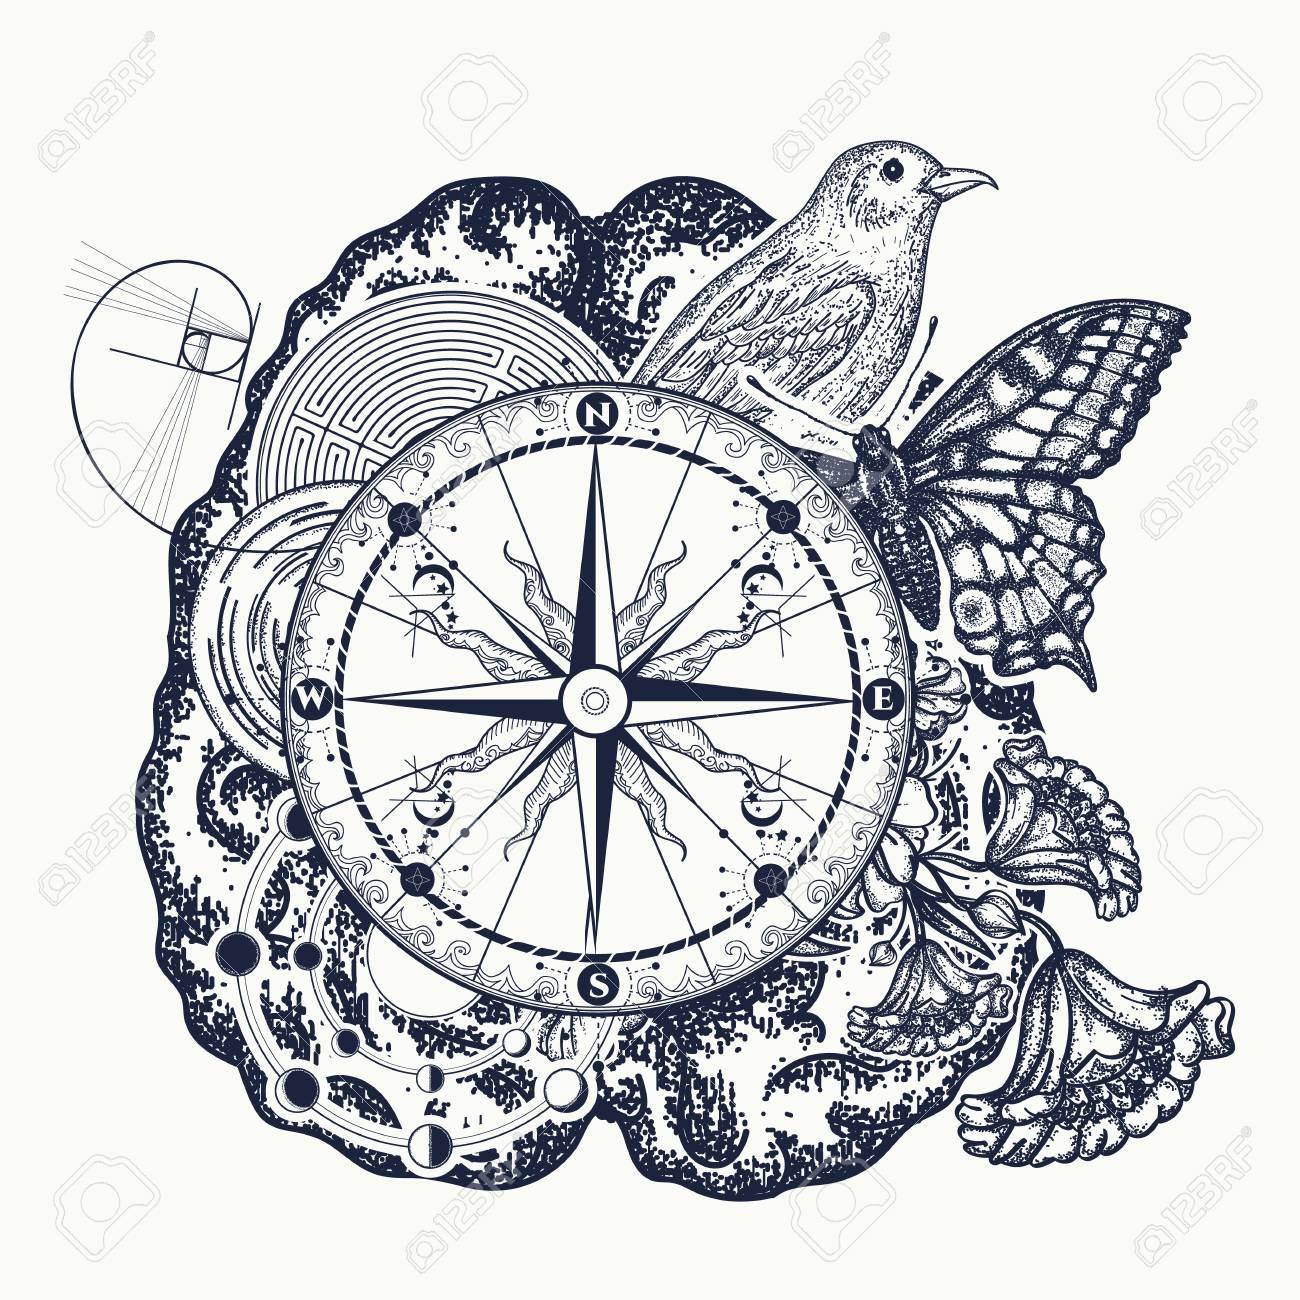 Left and right brain tattoo art symbol of thinking imagination left and right brain tattoo art symbol of thinking imagination science study biocorpaavc